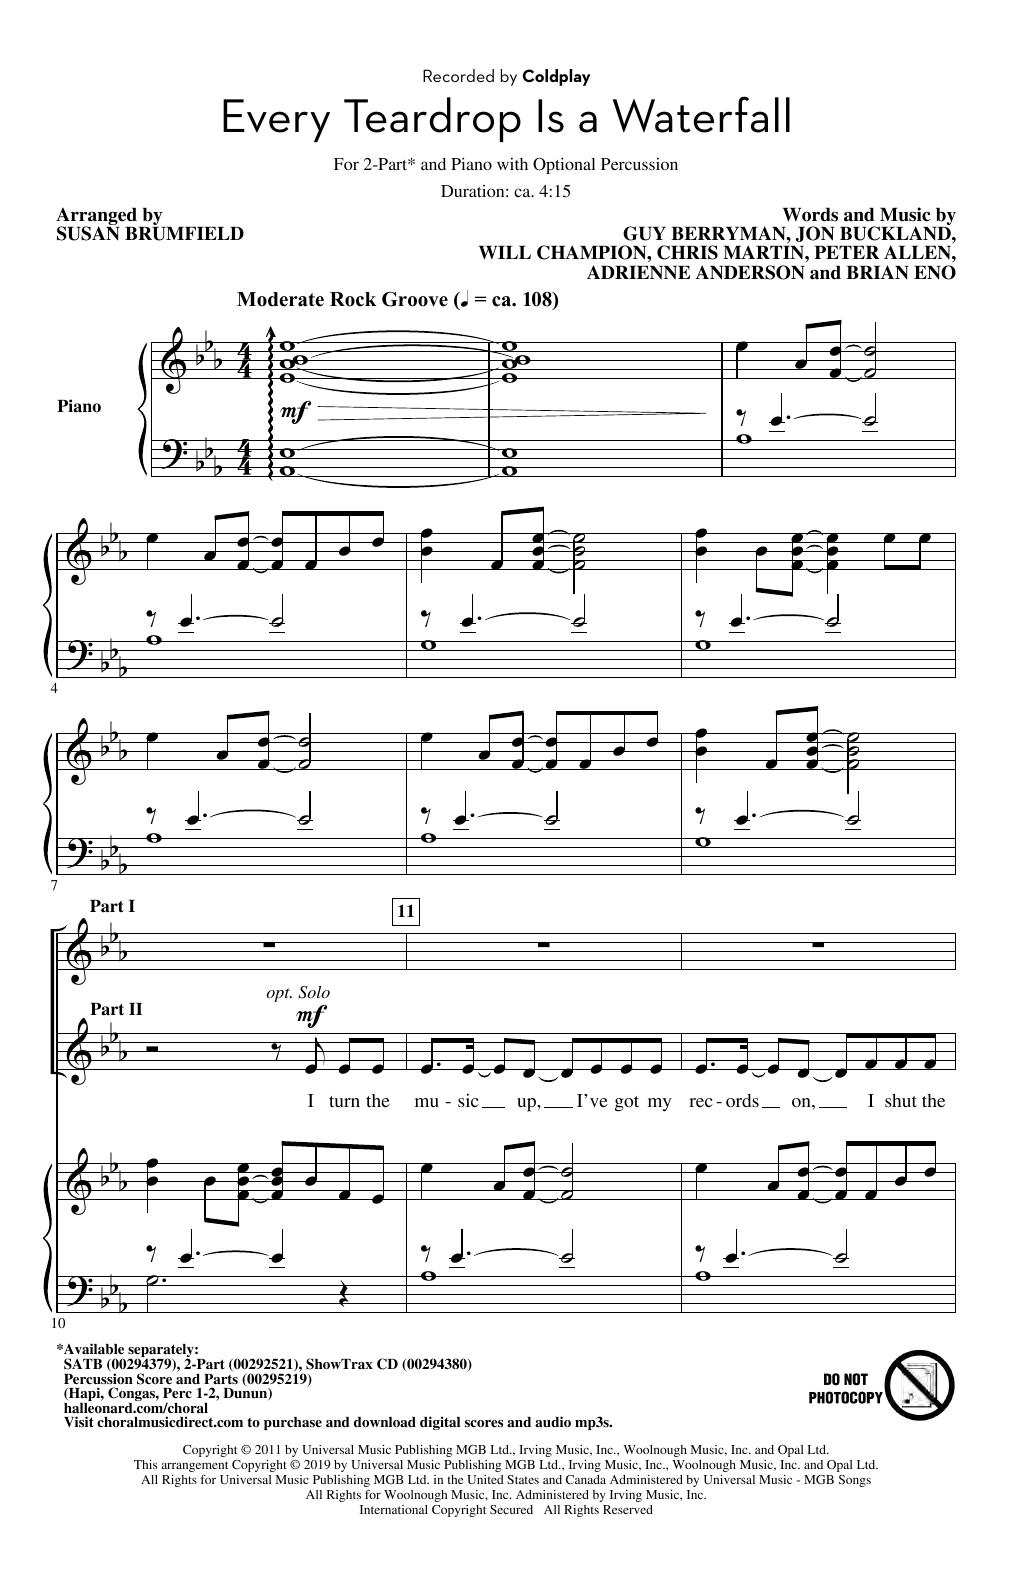 Every Teardrop Is A Waterfall (arr. Susan Brumfield) (2-Part Choir)